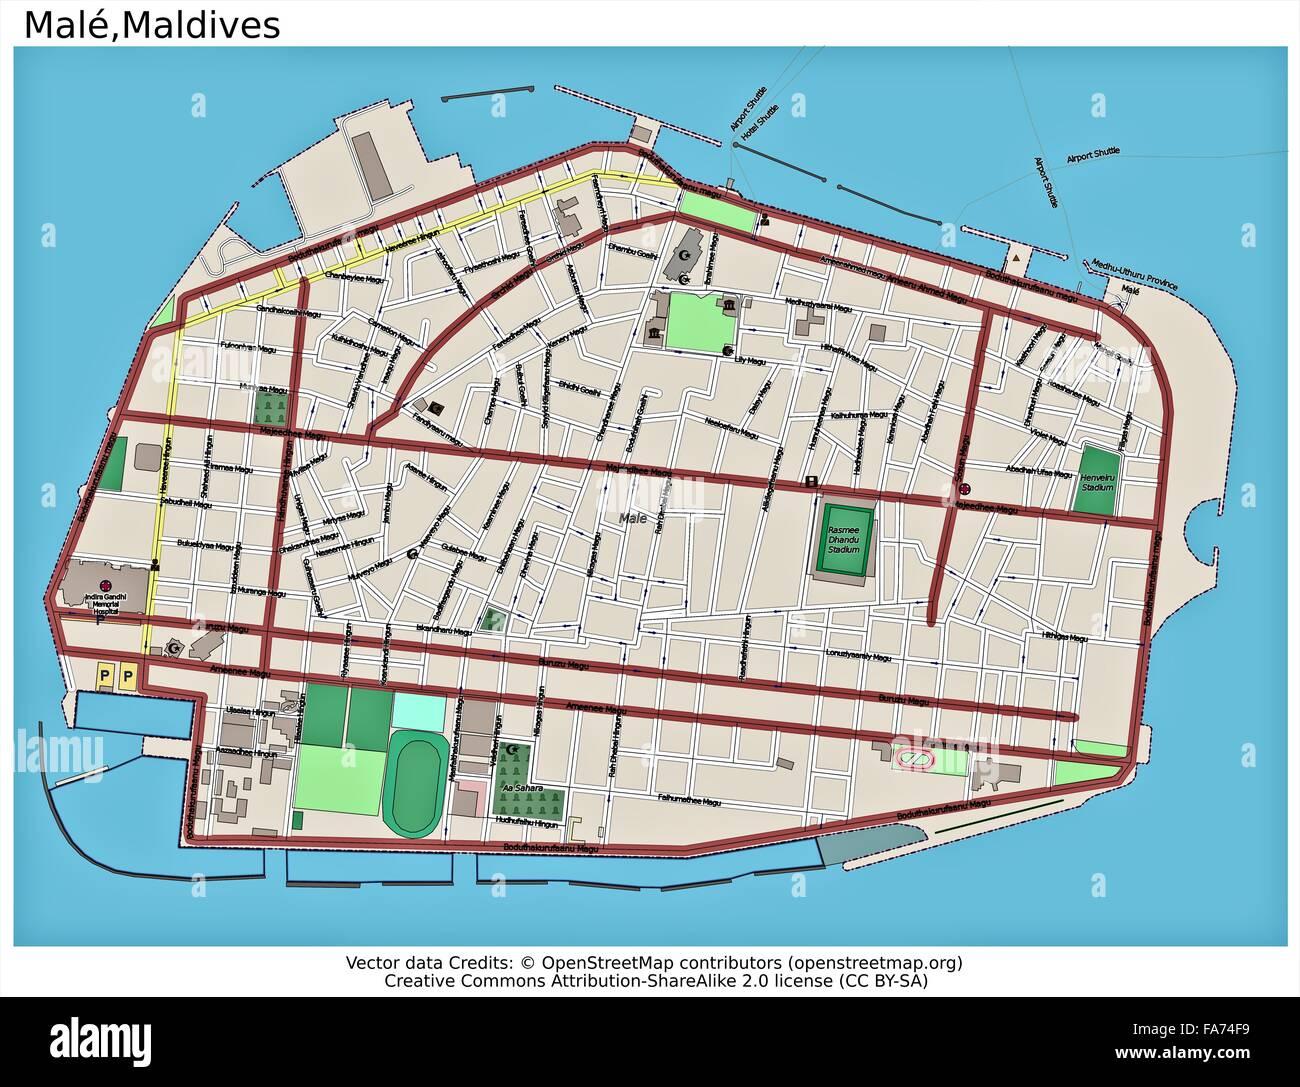 Male Maldives Location Map Stock Photo 92355629 Alamy